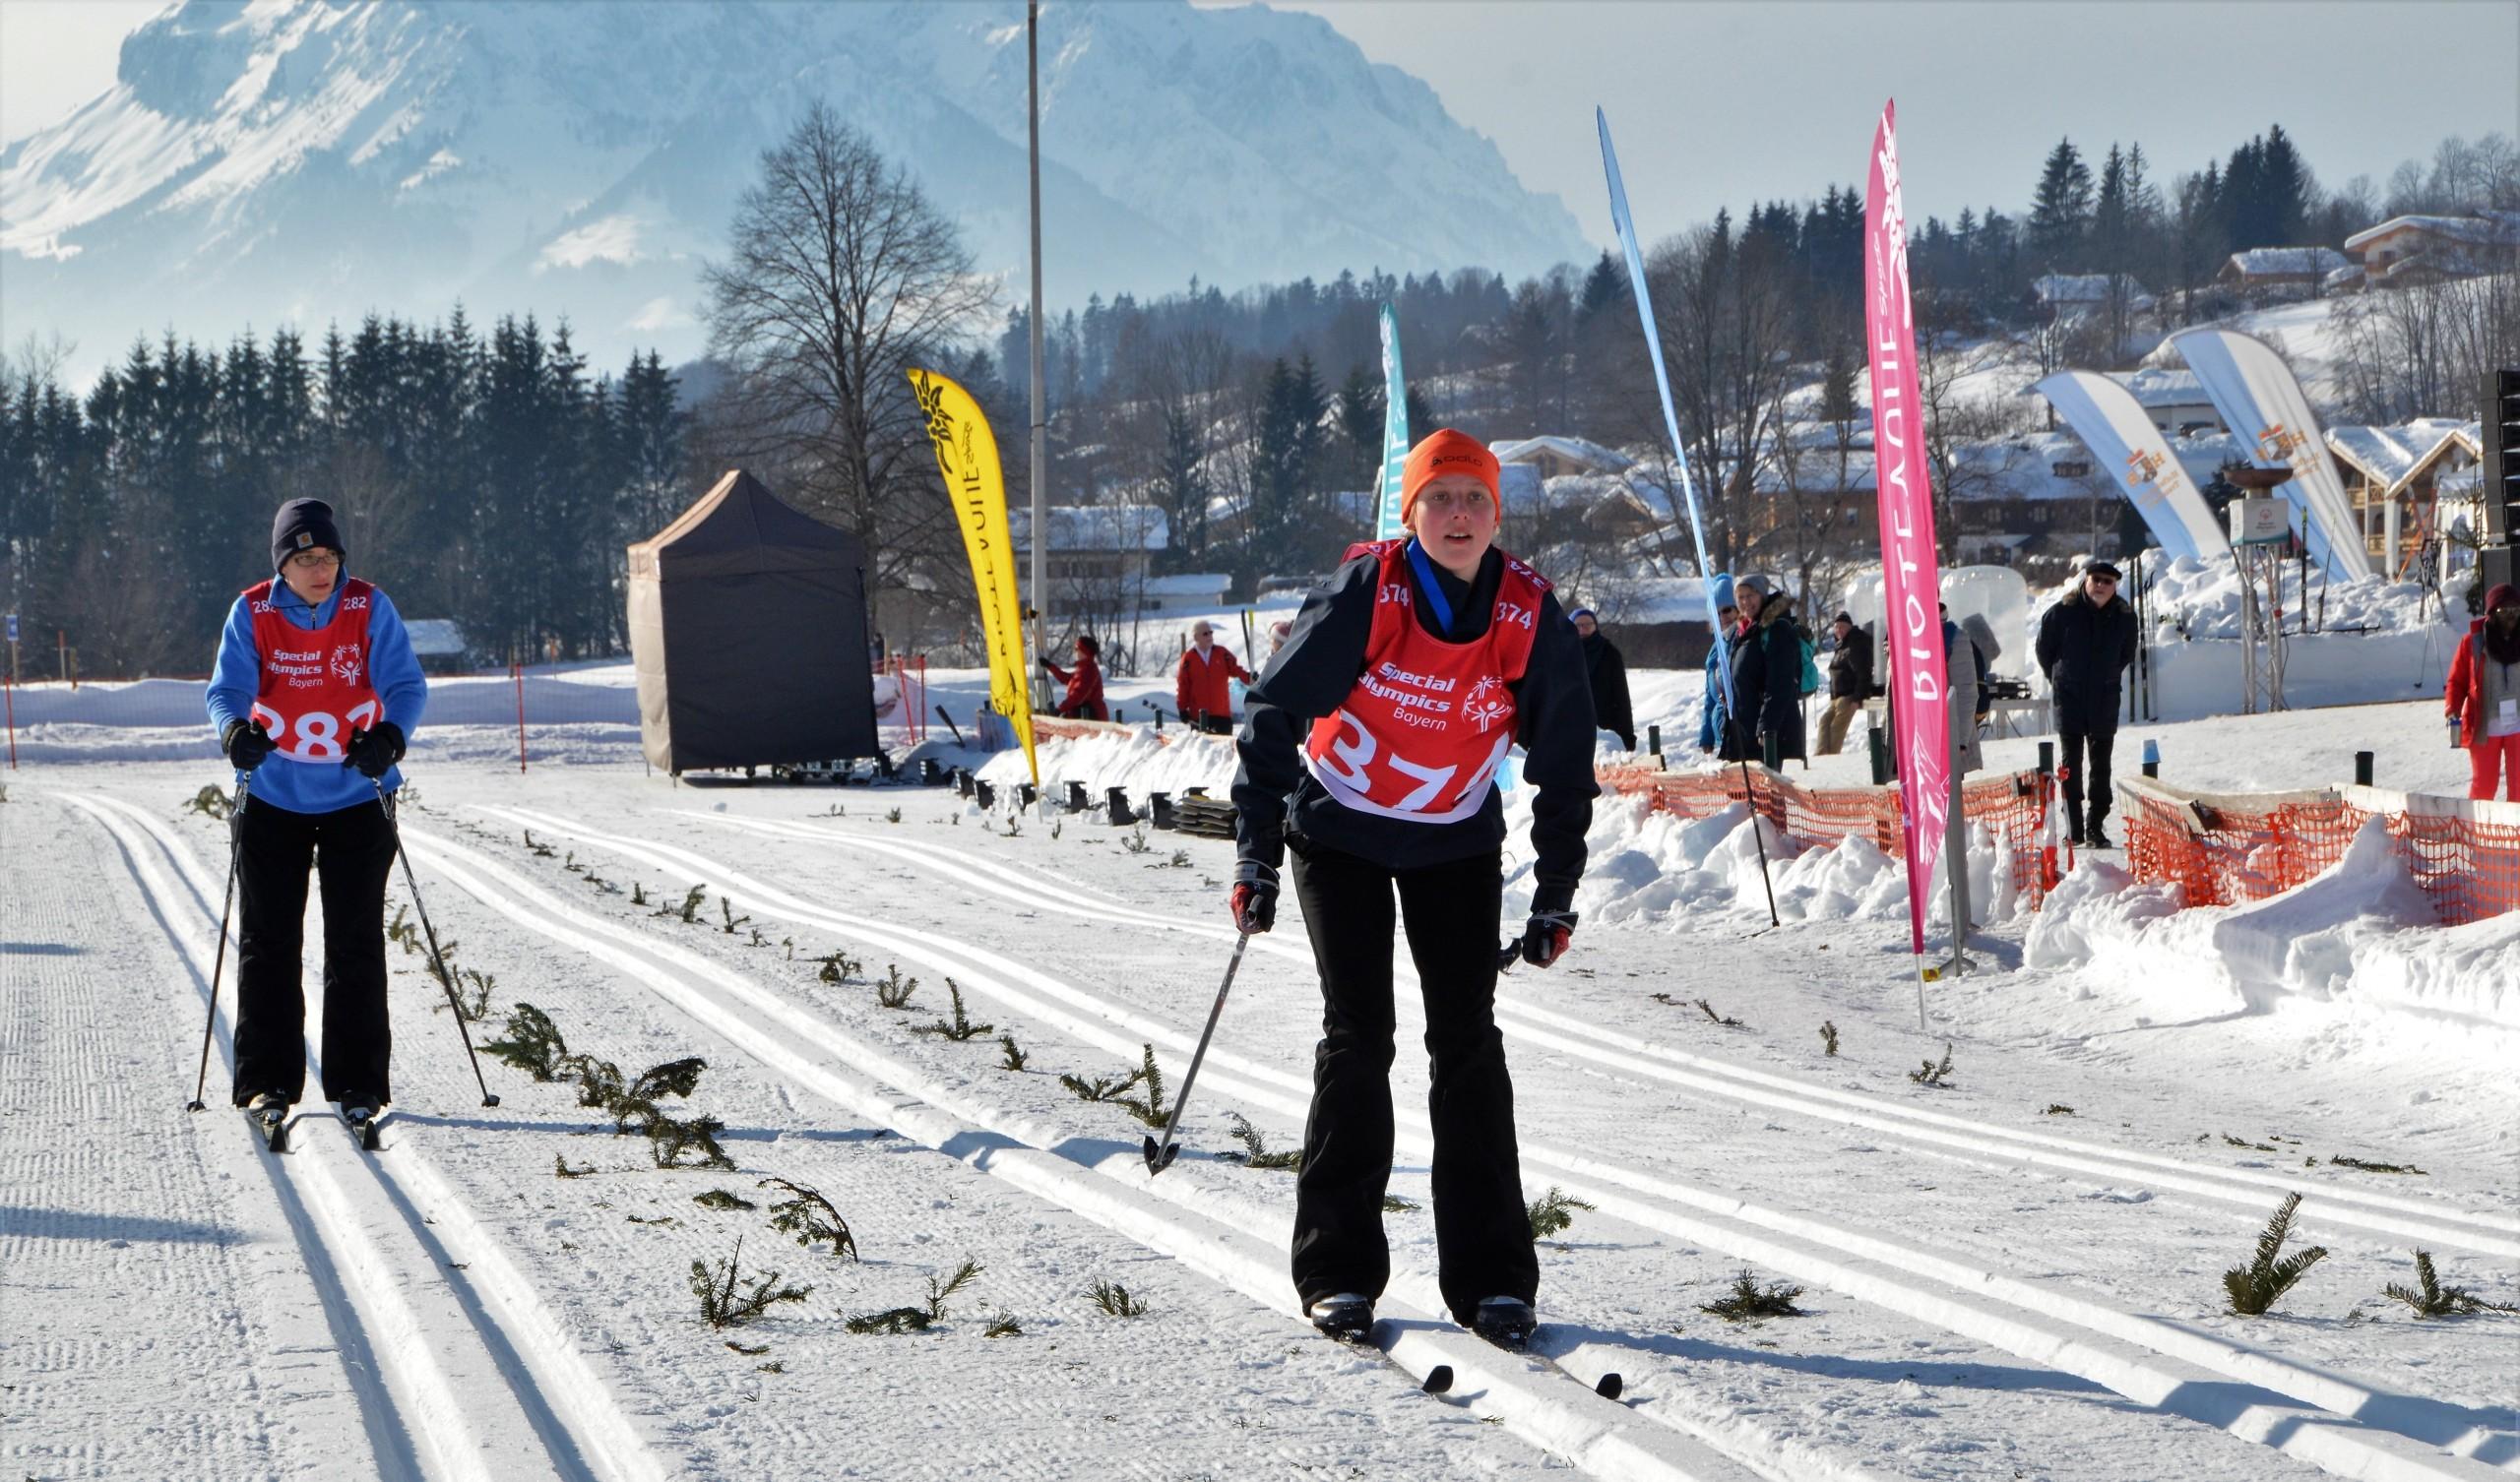 Special Olympics Winterspiele